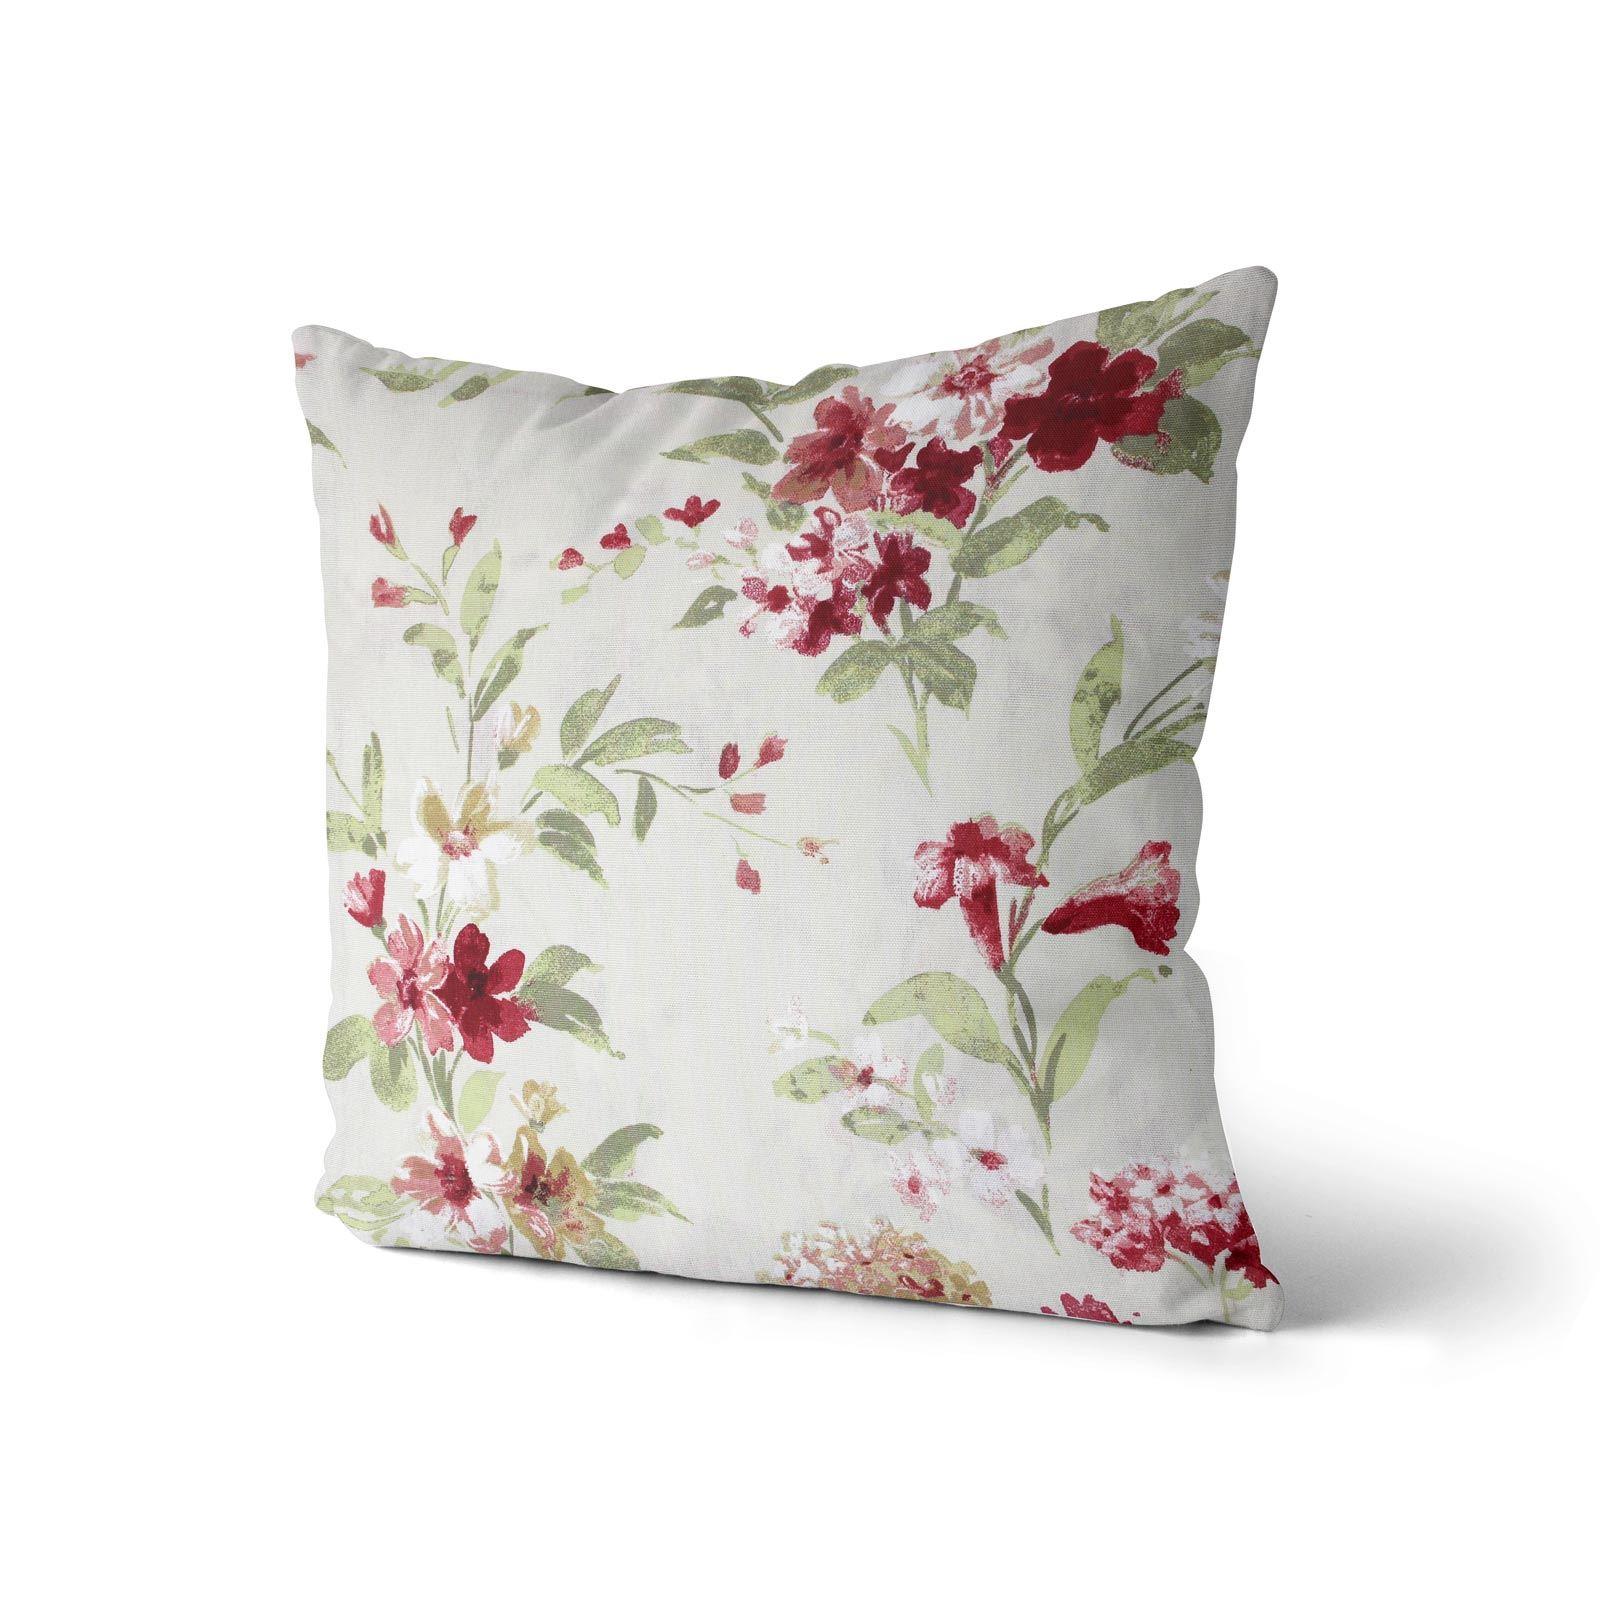 Vino-Tinto-Cushion-Covers-Coleccion-17-034-18-034-43cm-45cm-Cubierta miniatura 22